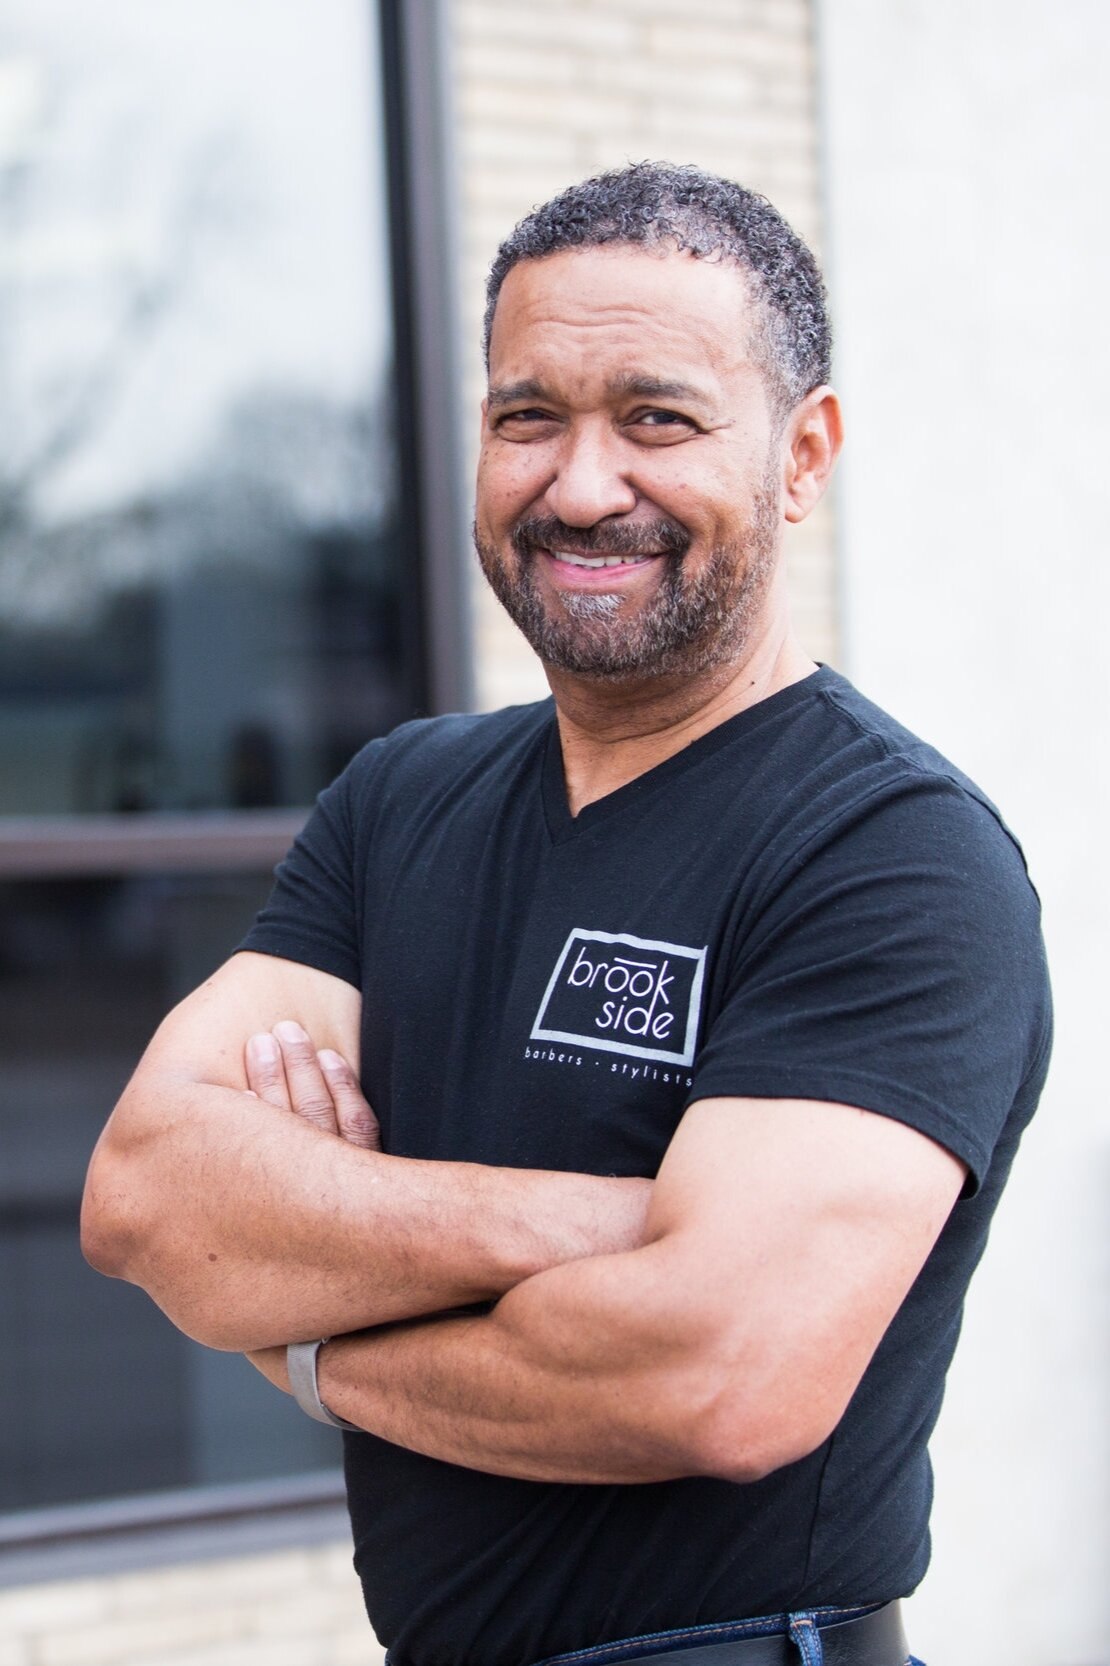 Steve - Owner/Master Barberwith Brookside since 1998